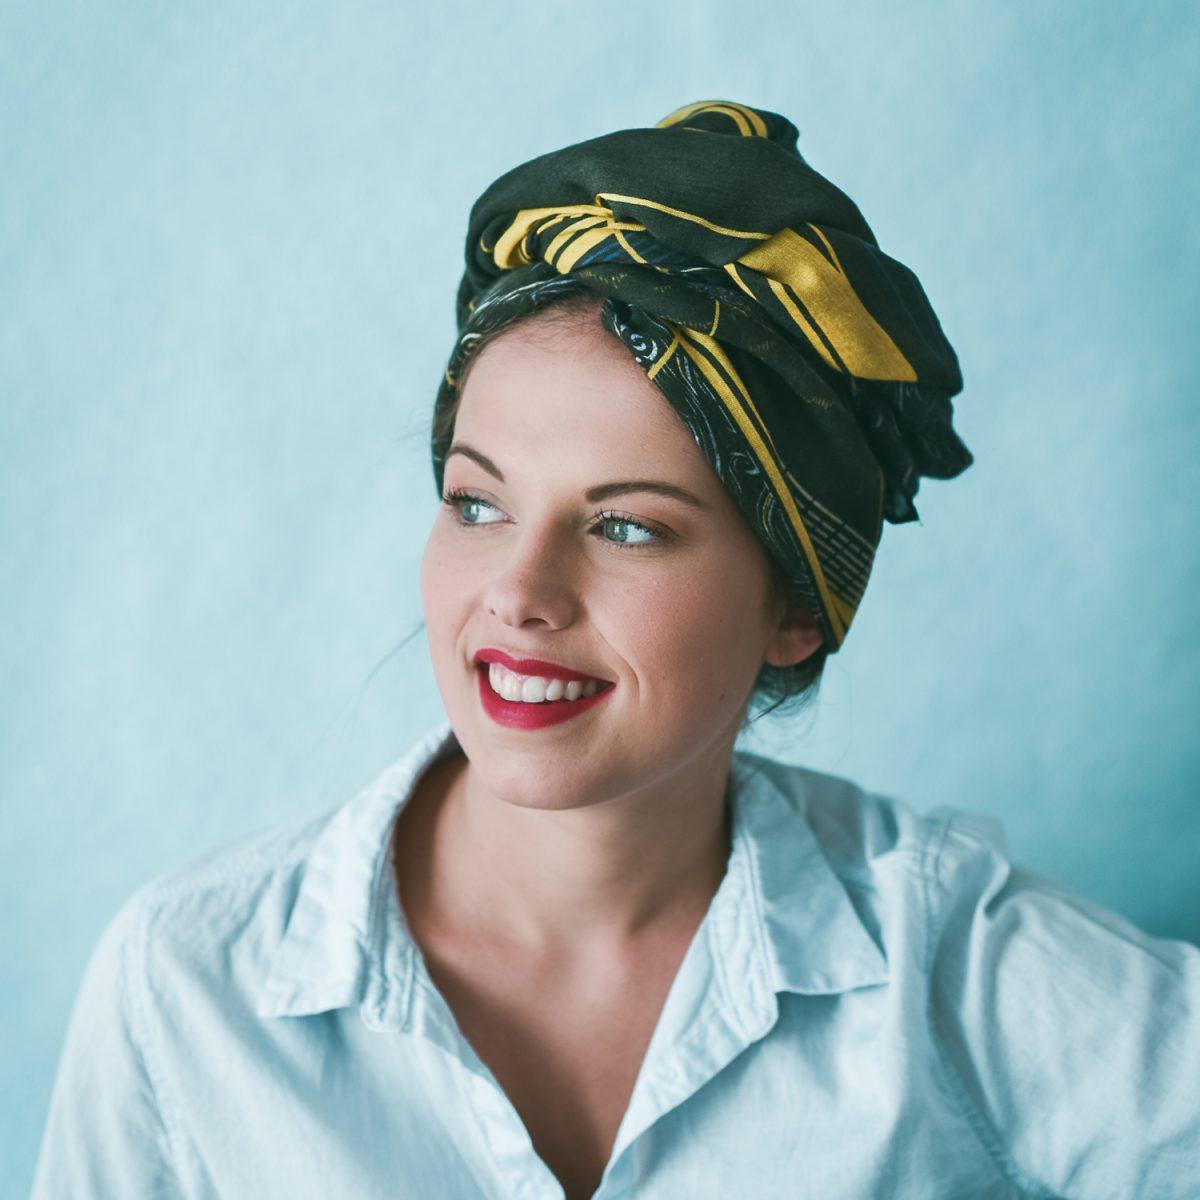 Âmulet Foulard Follow Rivers fashion headwrapped style